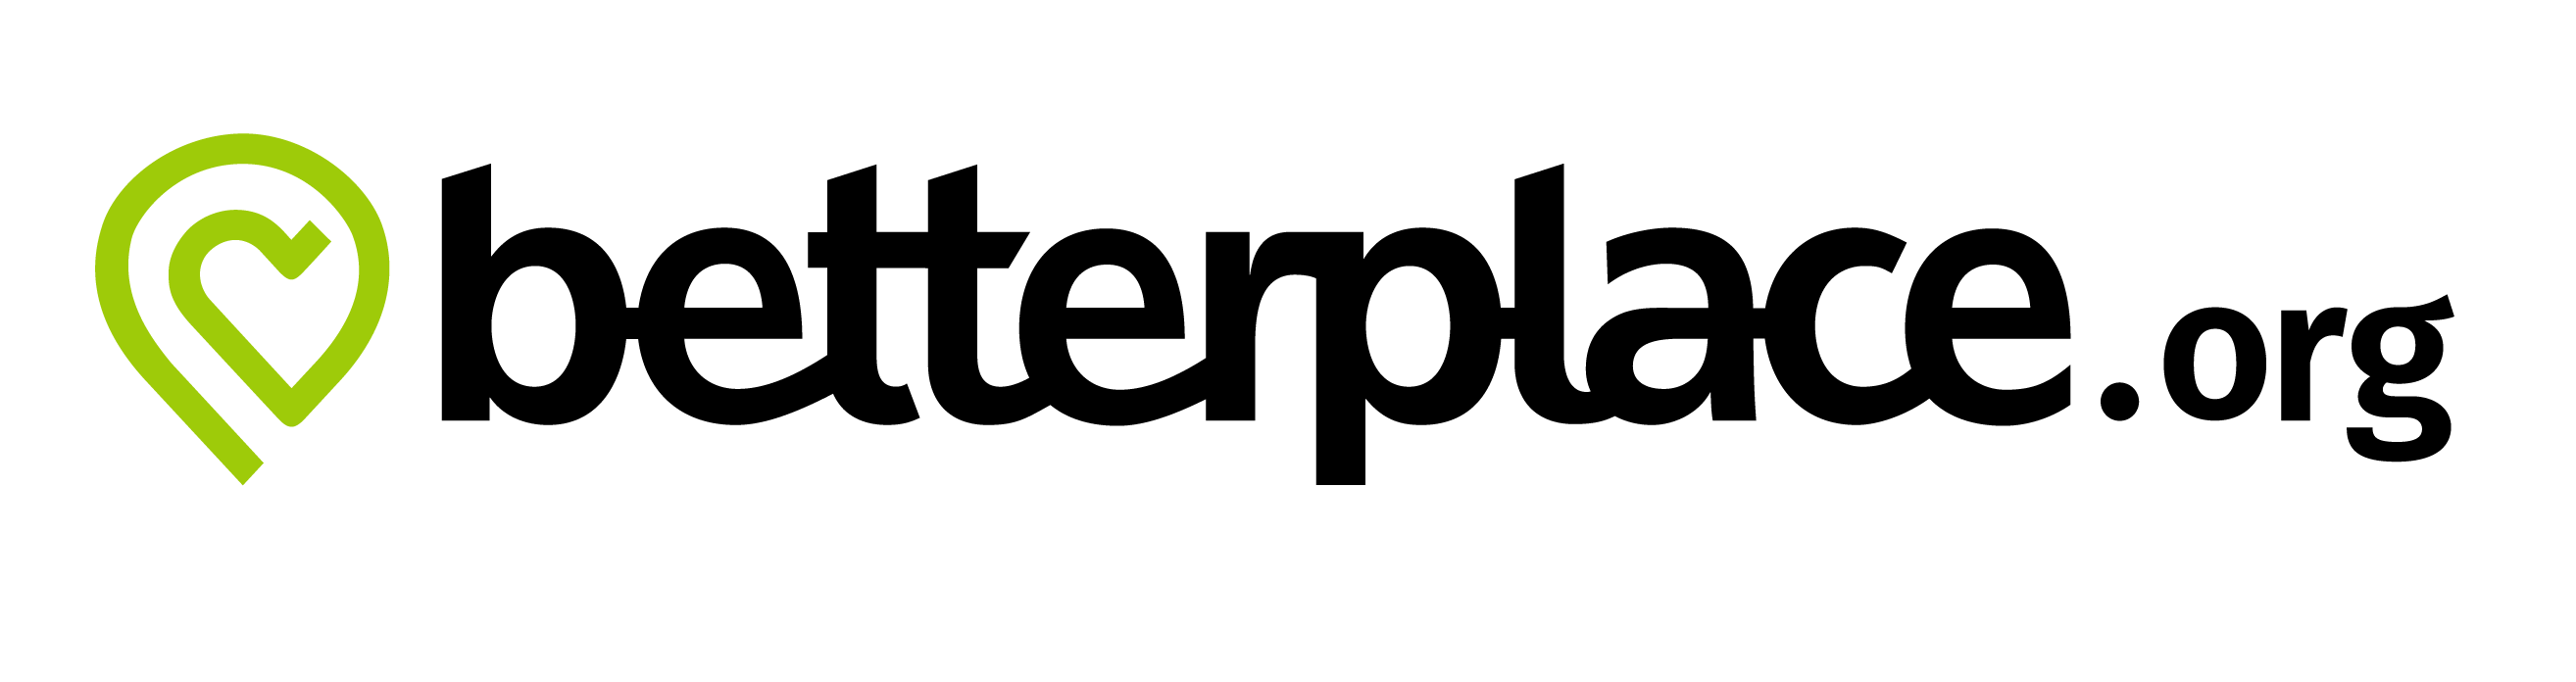 Logo Betterplace